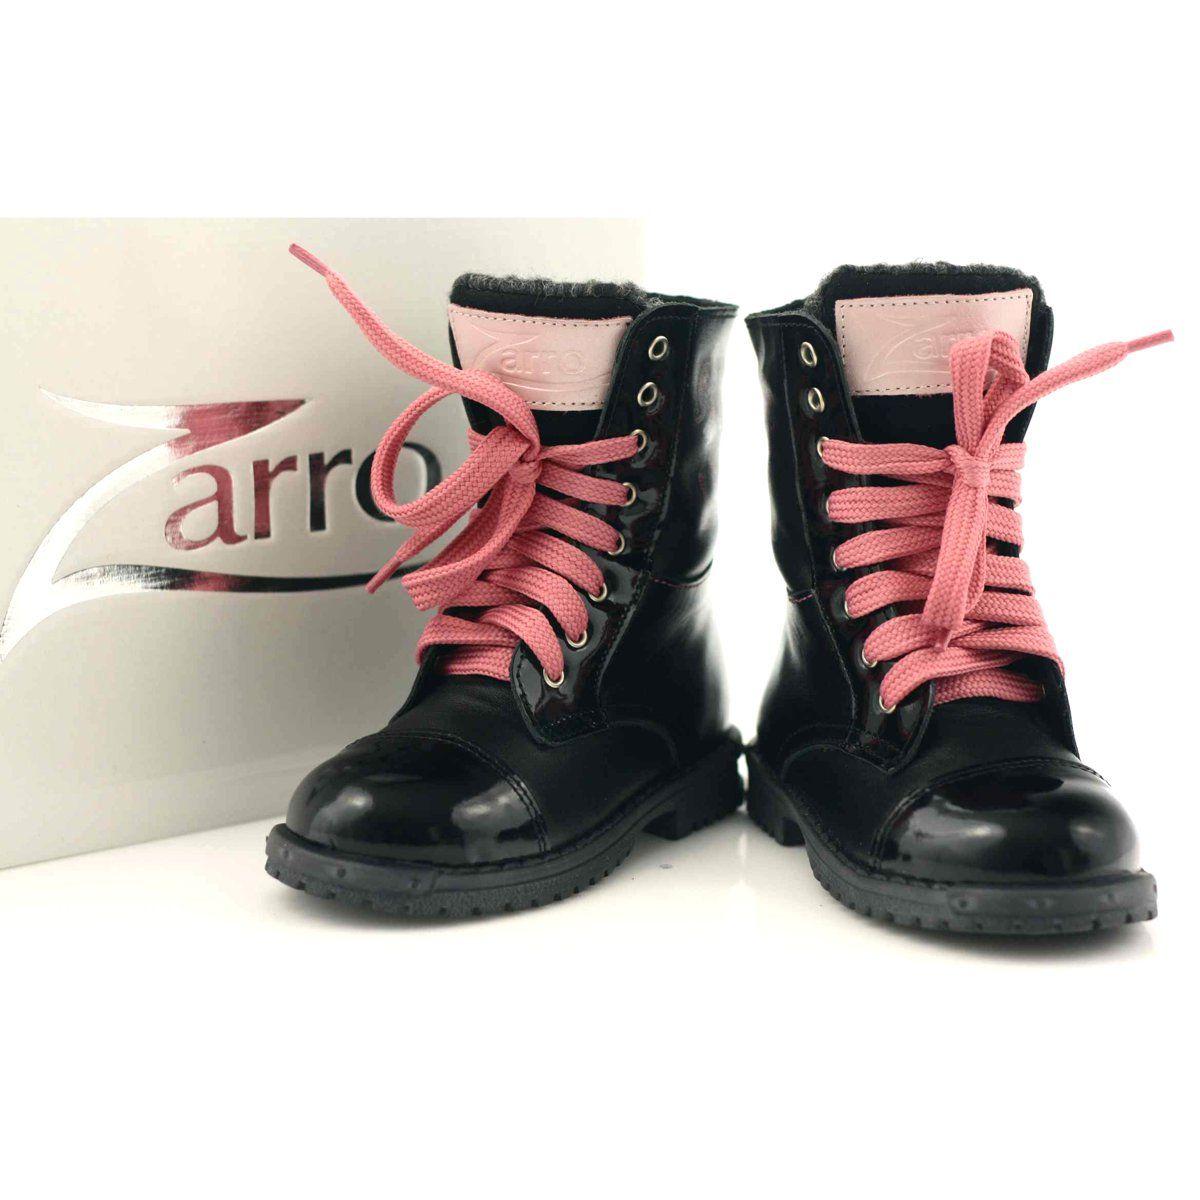 Ren But Trzewiki Buty Dzieciece Zarro 38 01 Czarne Rozowe Boots Winter Boot Shoes